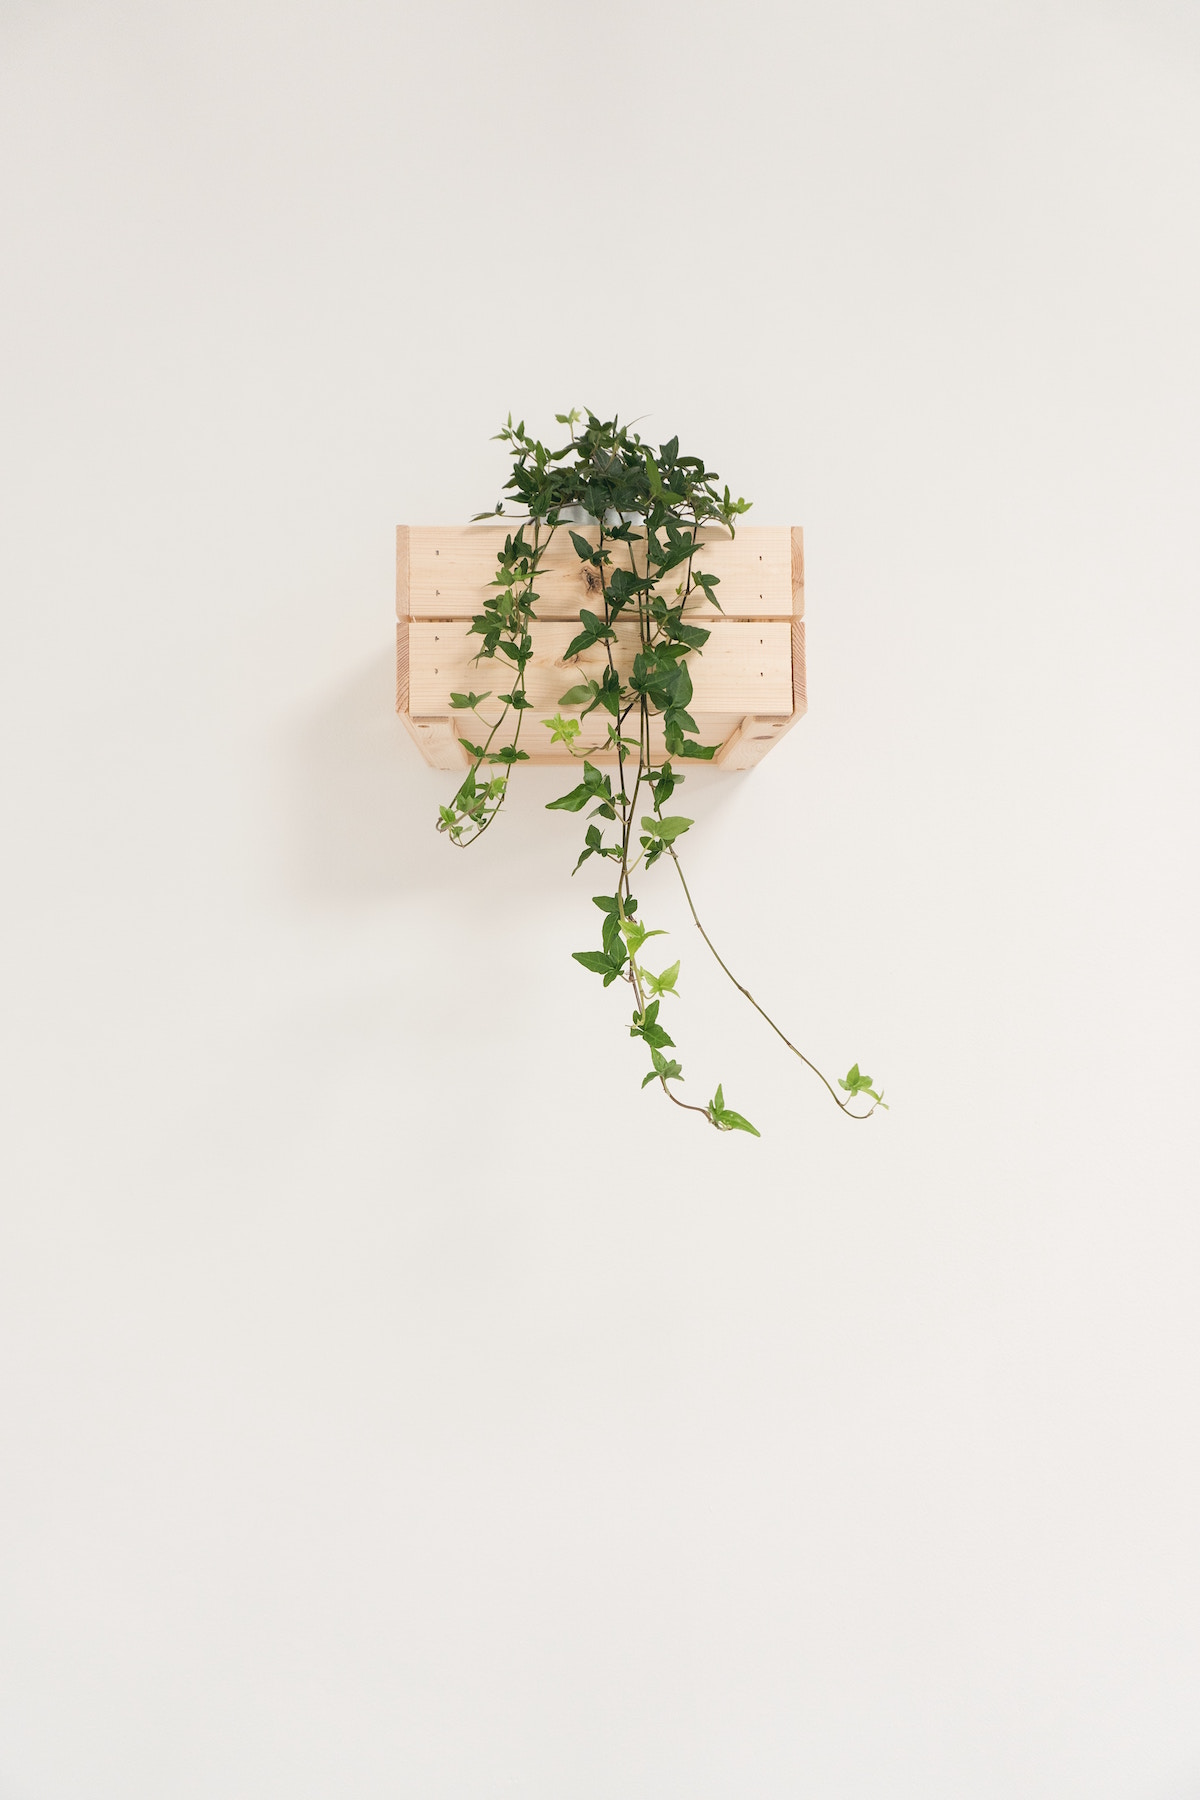 sobne rastline gardenia cvetlicarna beautyfull blog bršljan